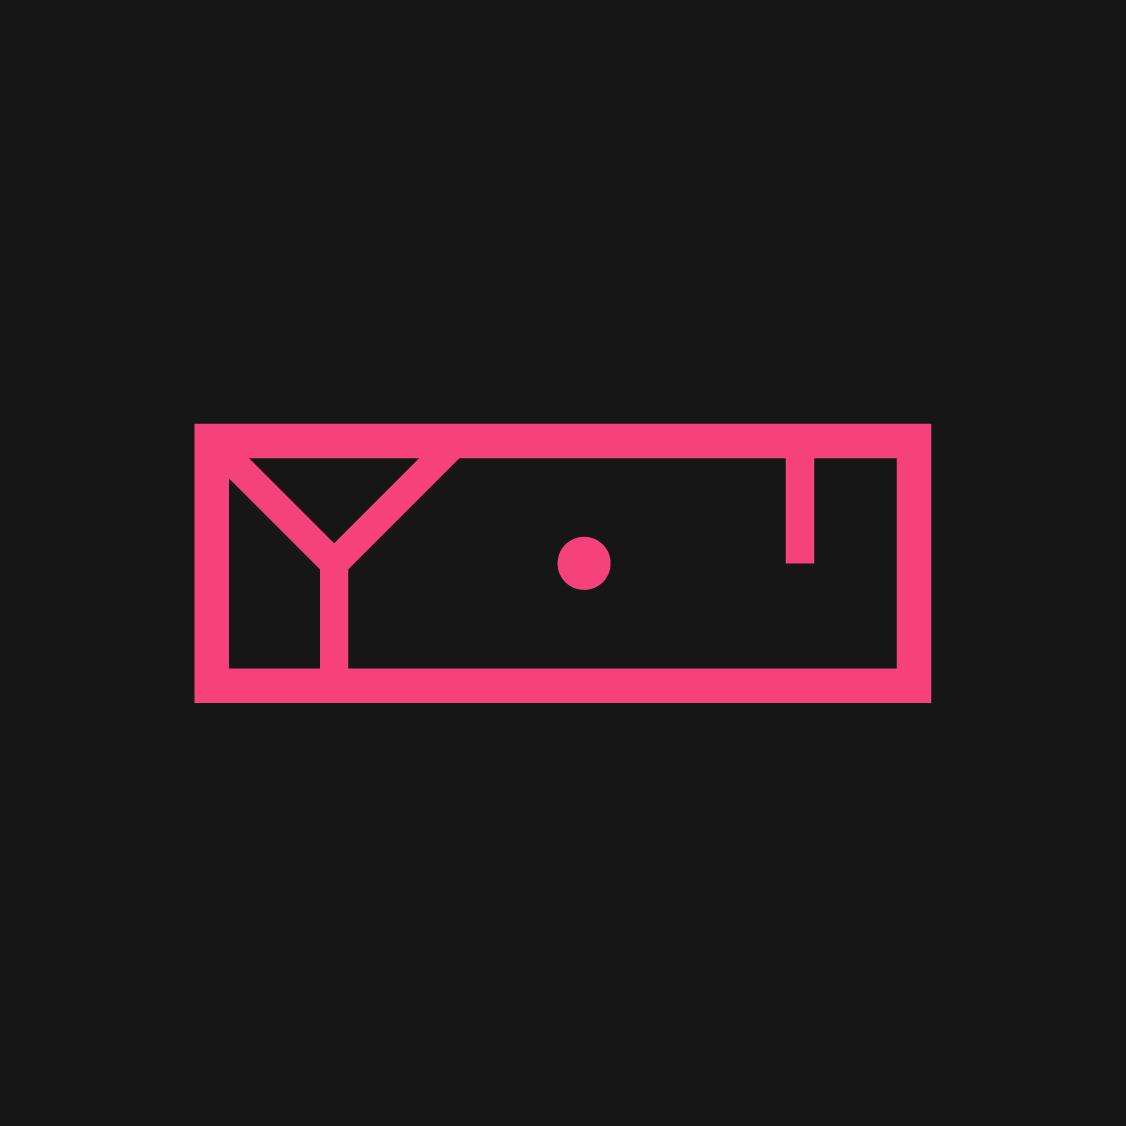 all-logos-2020-75